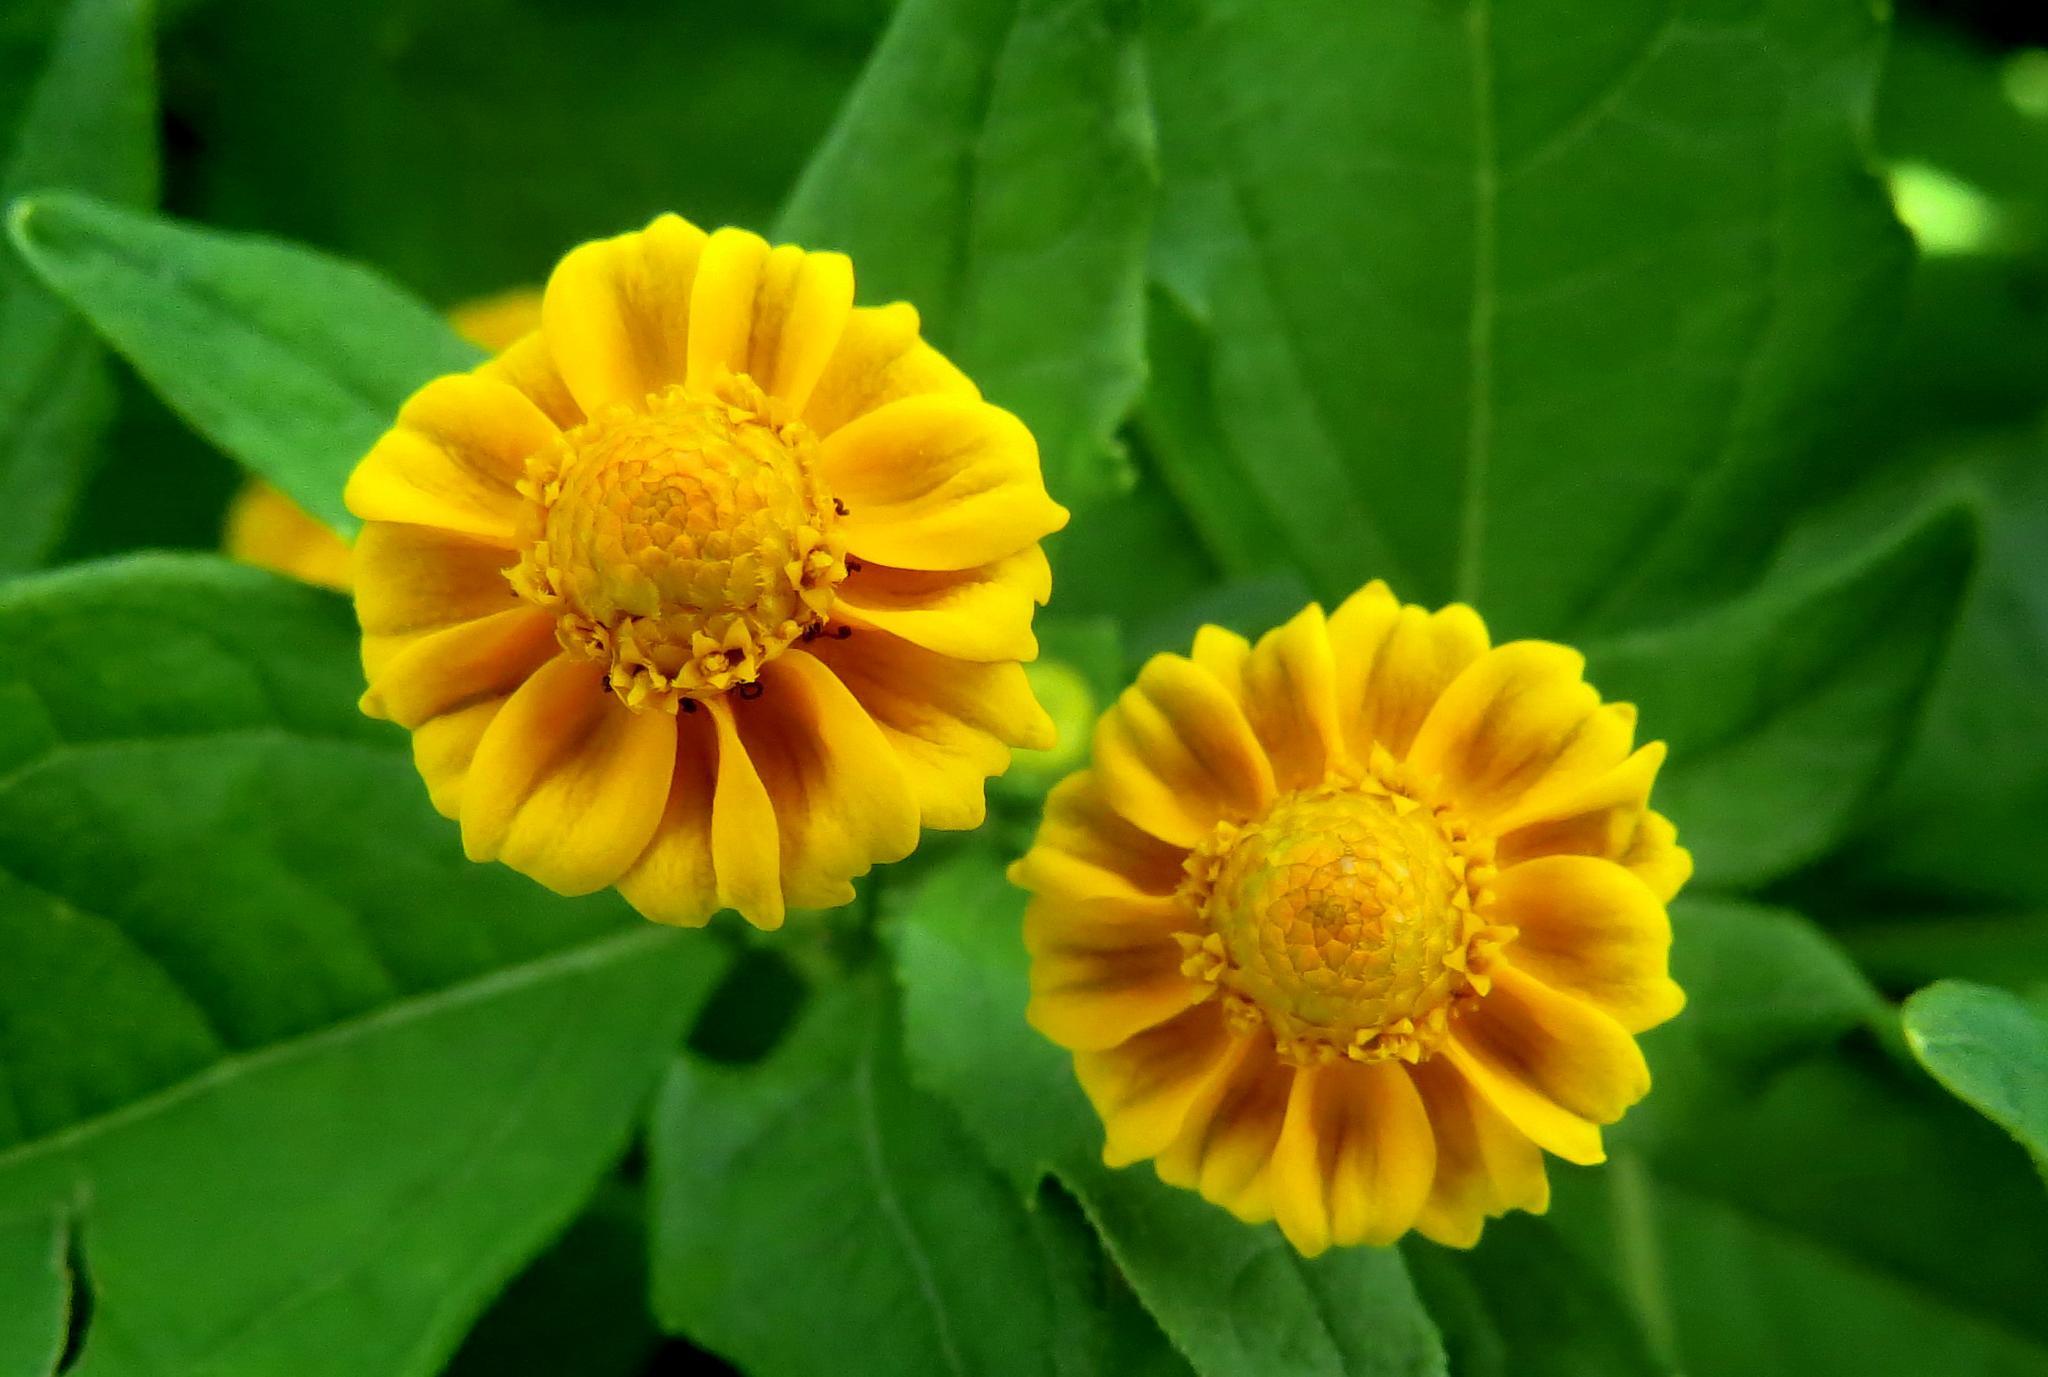 Micro flower by Nestor